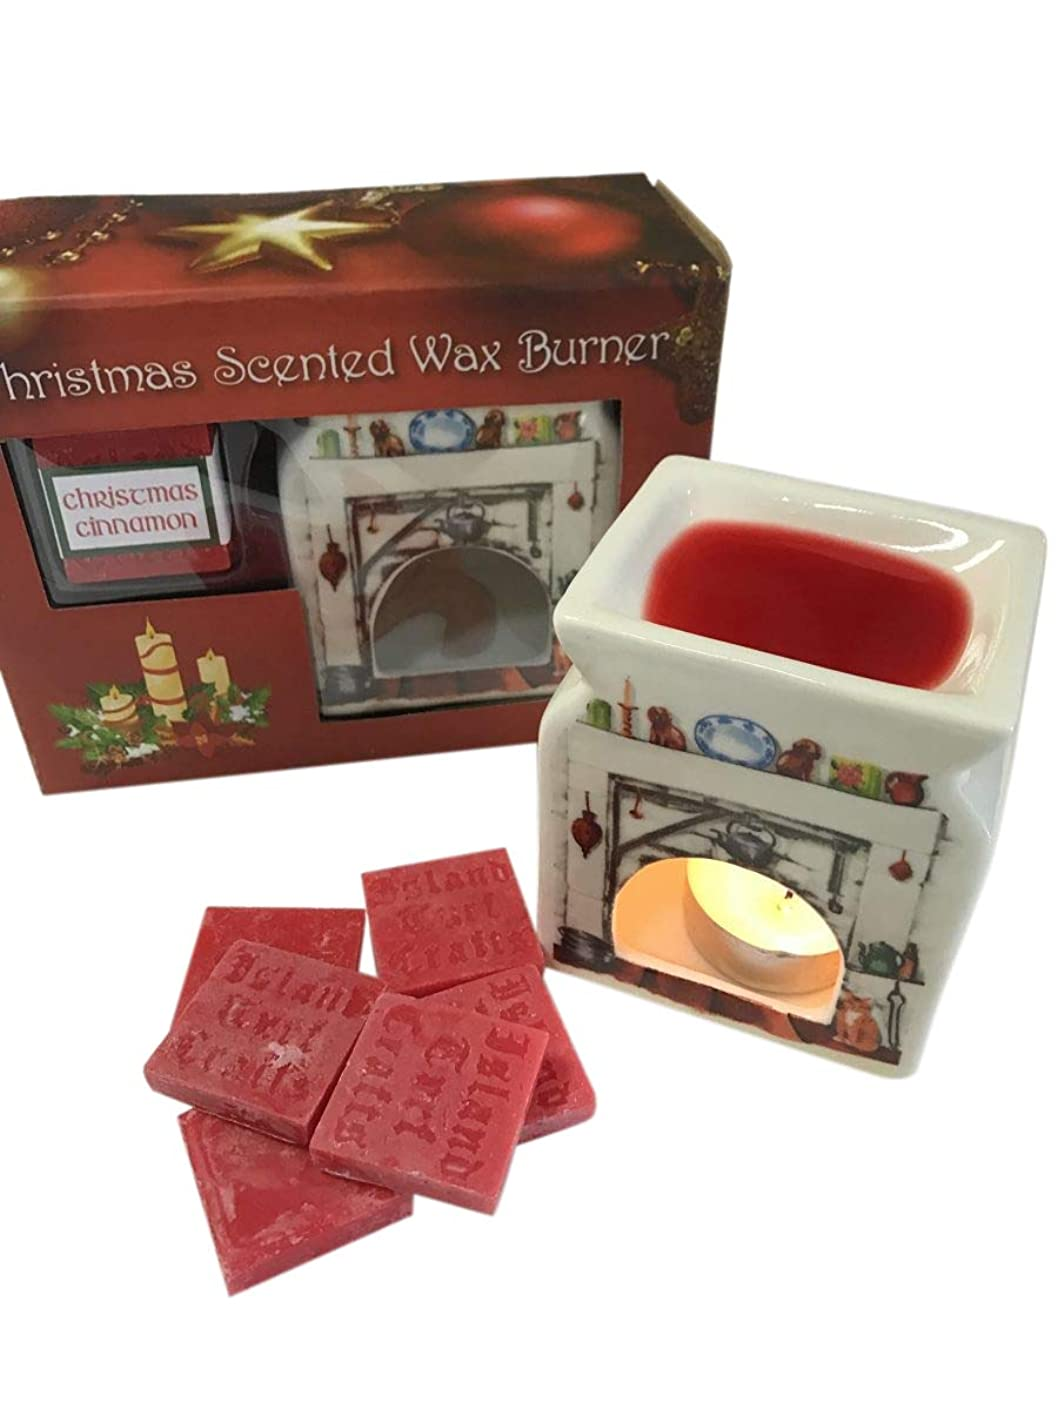 Island Turf Crafts Christmas Cinnamon Scented Irish Wax Burner Fireplace Home Decoration from Ireland